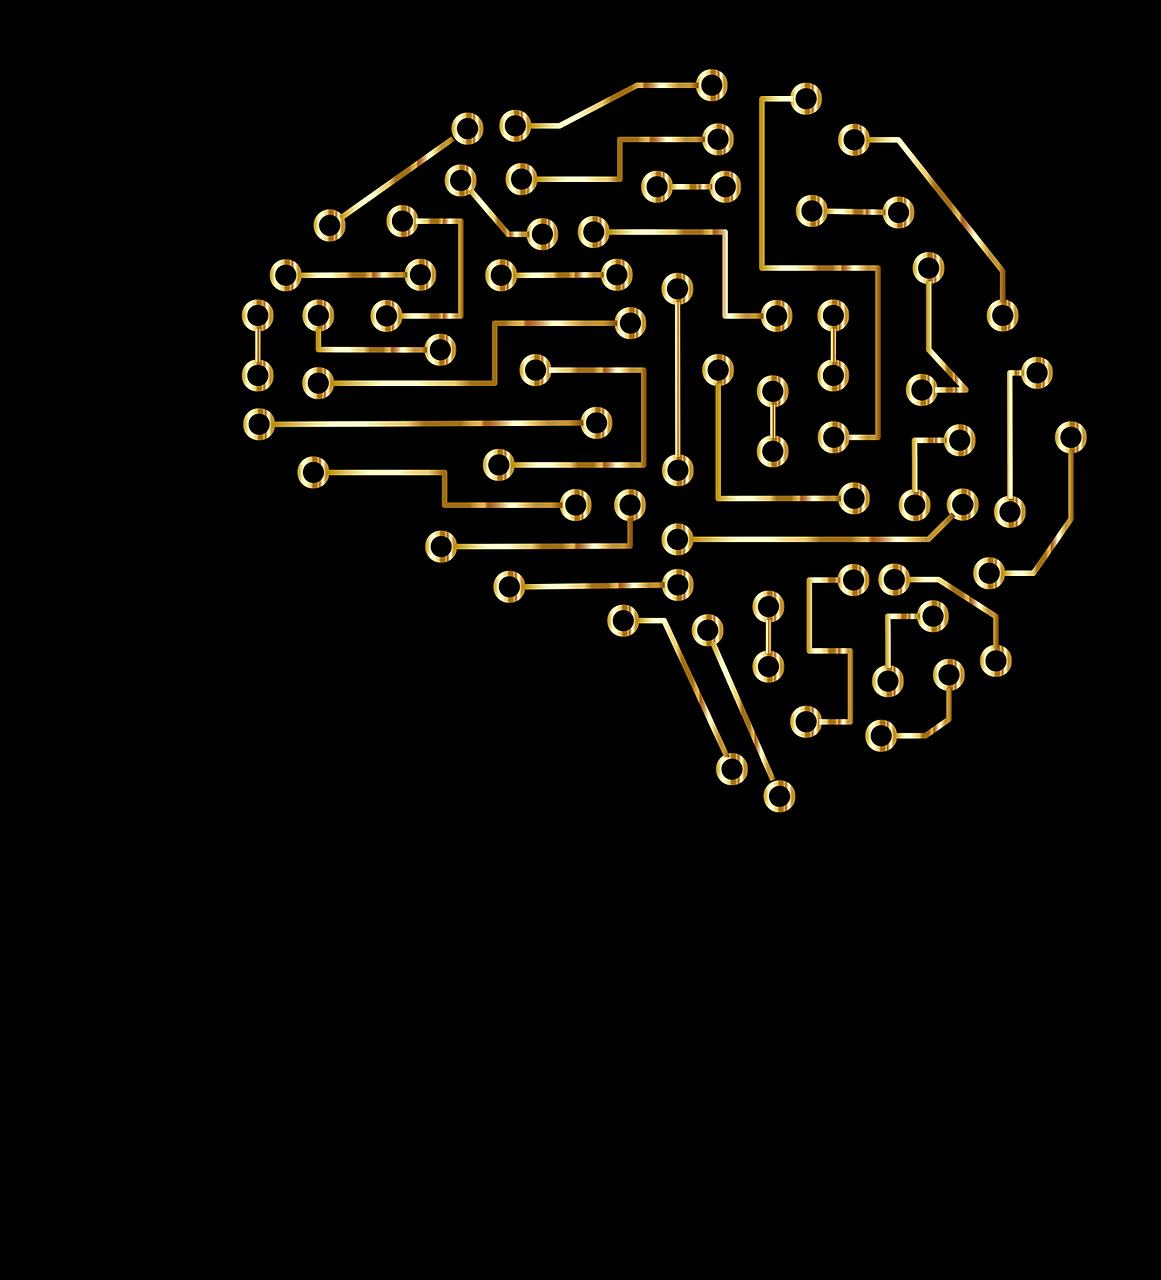 Brain Circuits Electronics  - GDJ / Pixabay